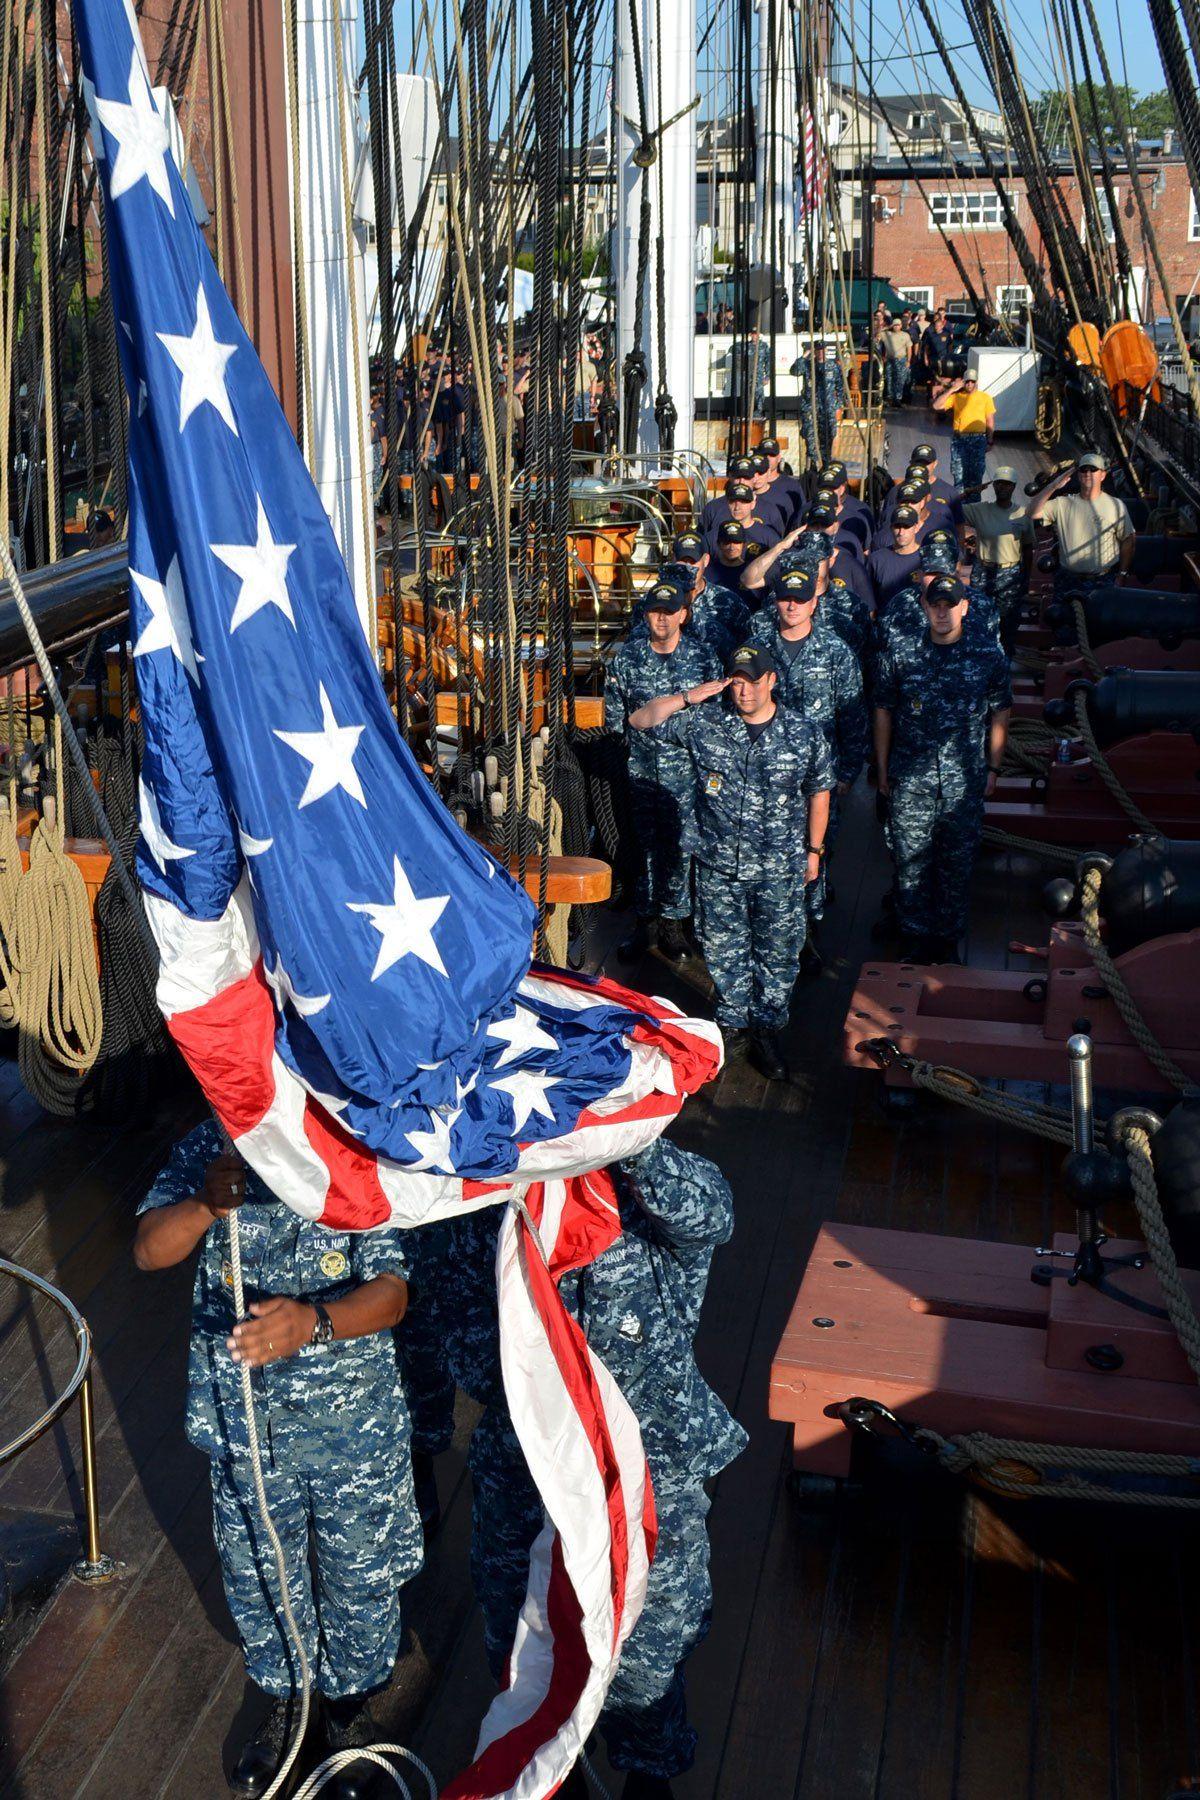 352a7d5fc356 USS CONSTITUTION - The War of 1812